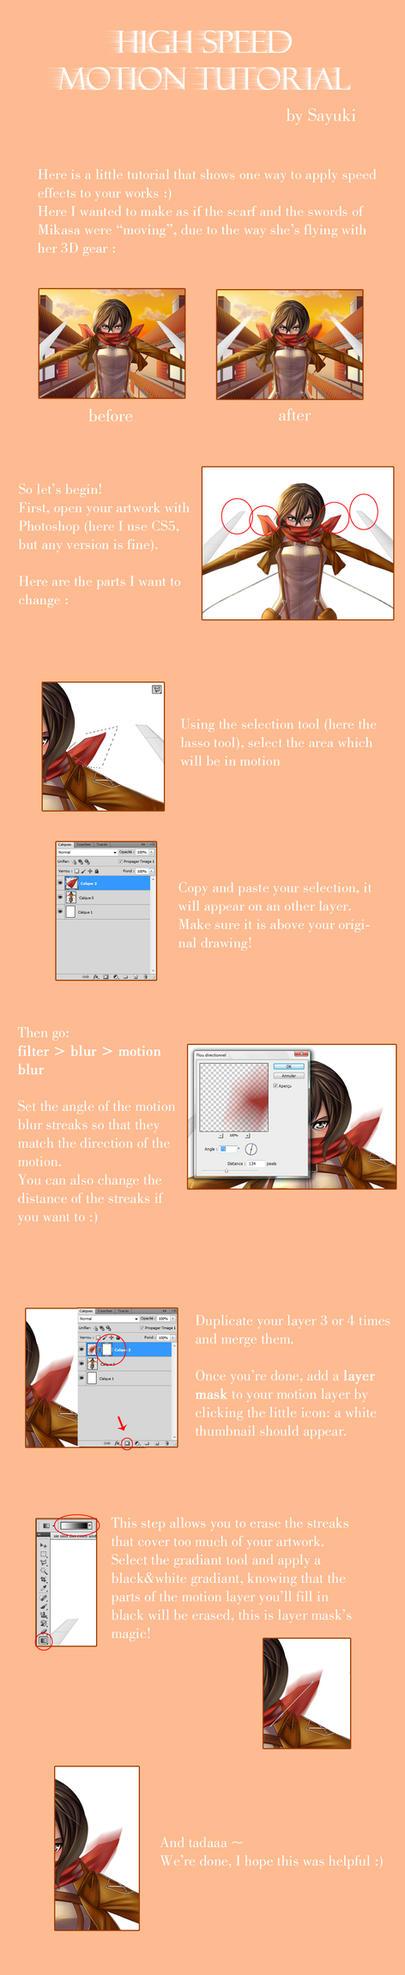 Photoshop digital art and painting tutorials on artistshospital eelgod 322 41 speed effects tutorial by sayuki art baditri Image collections